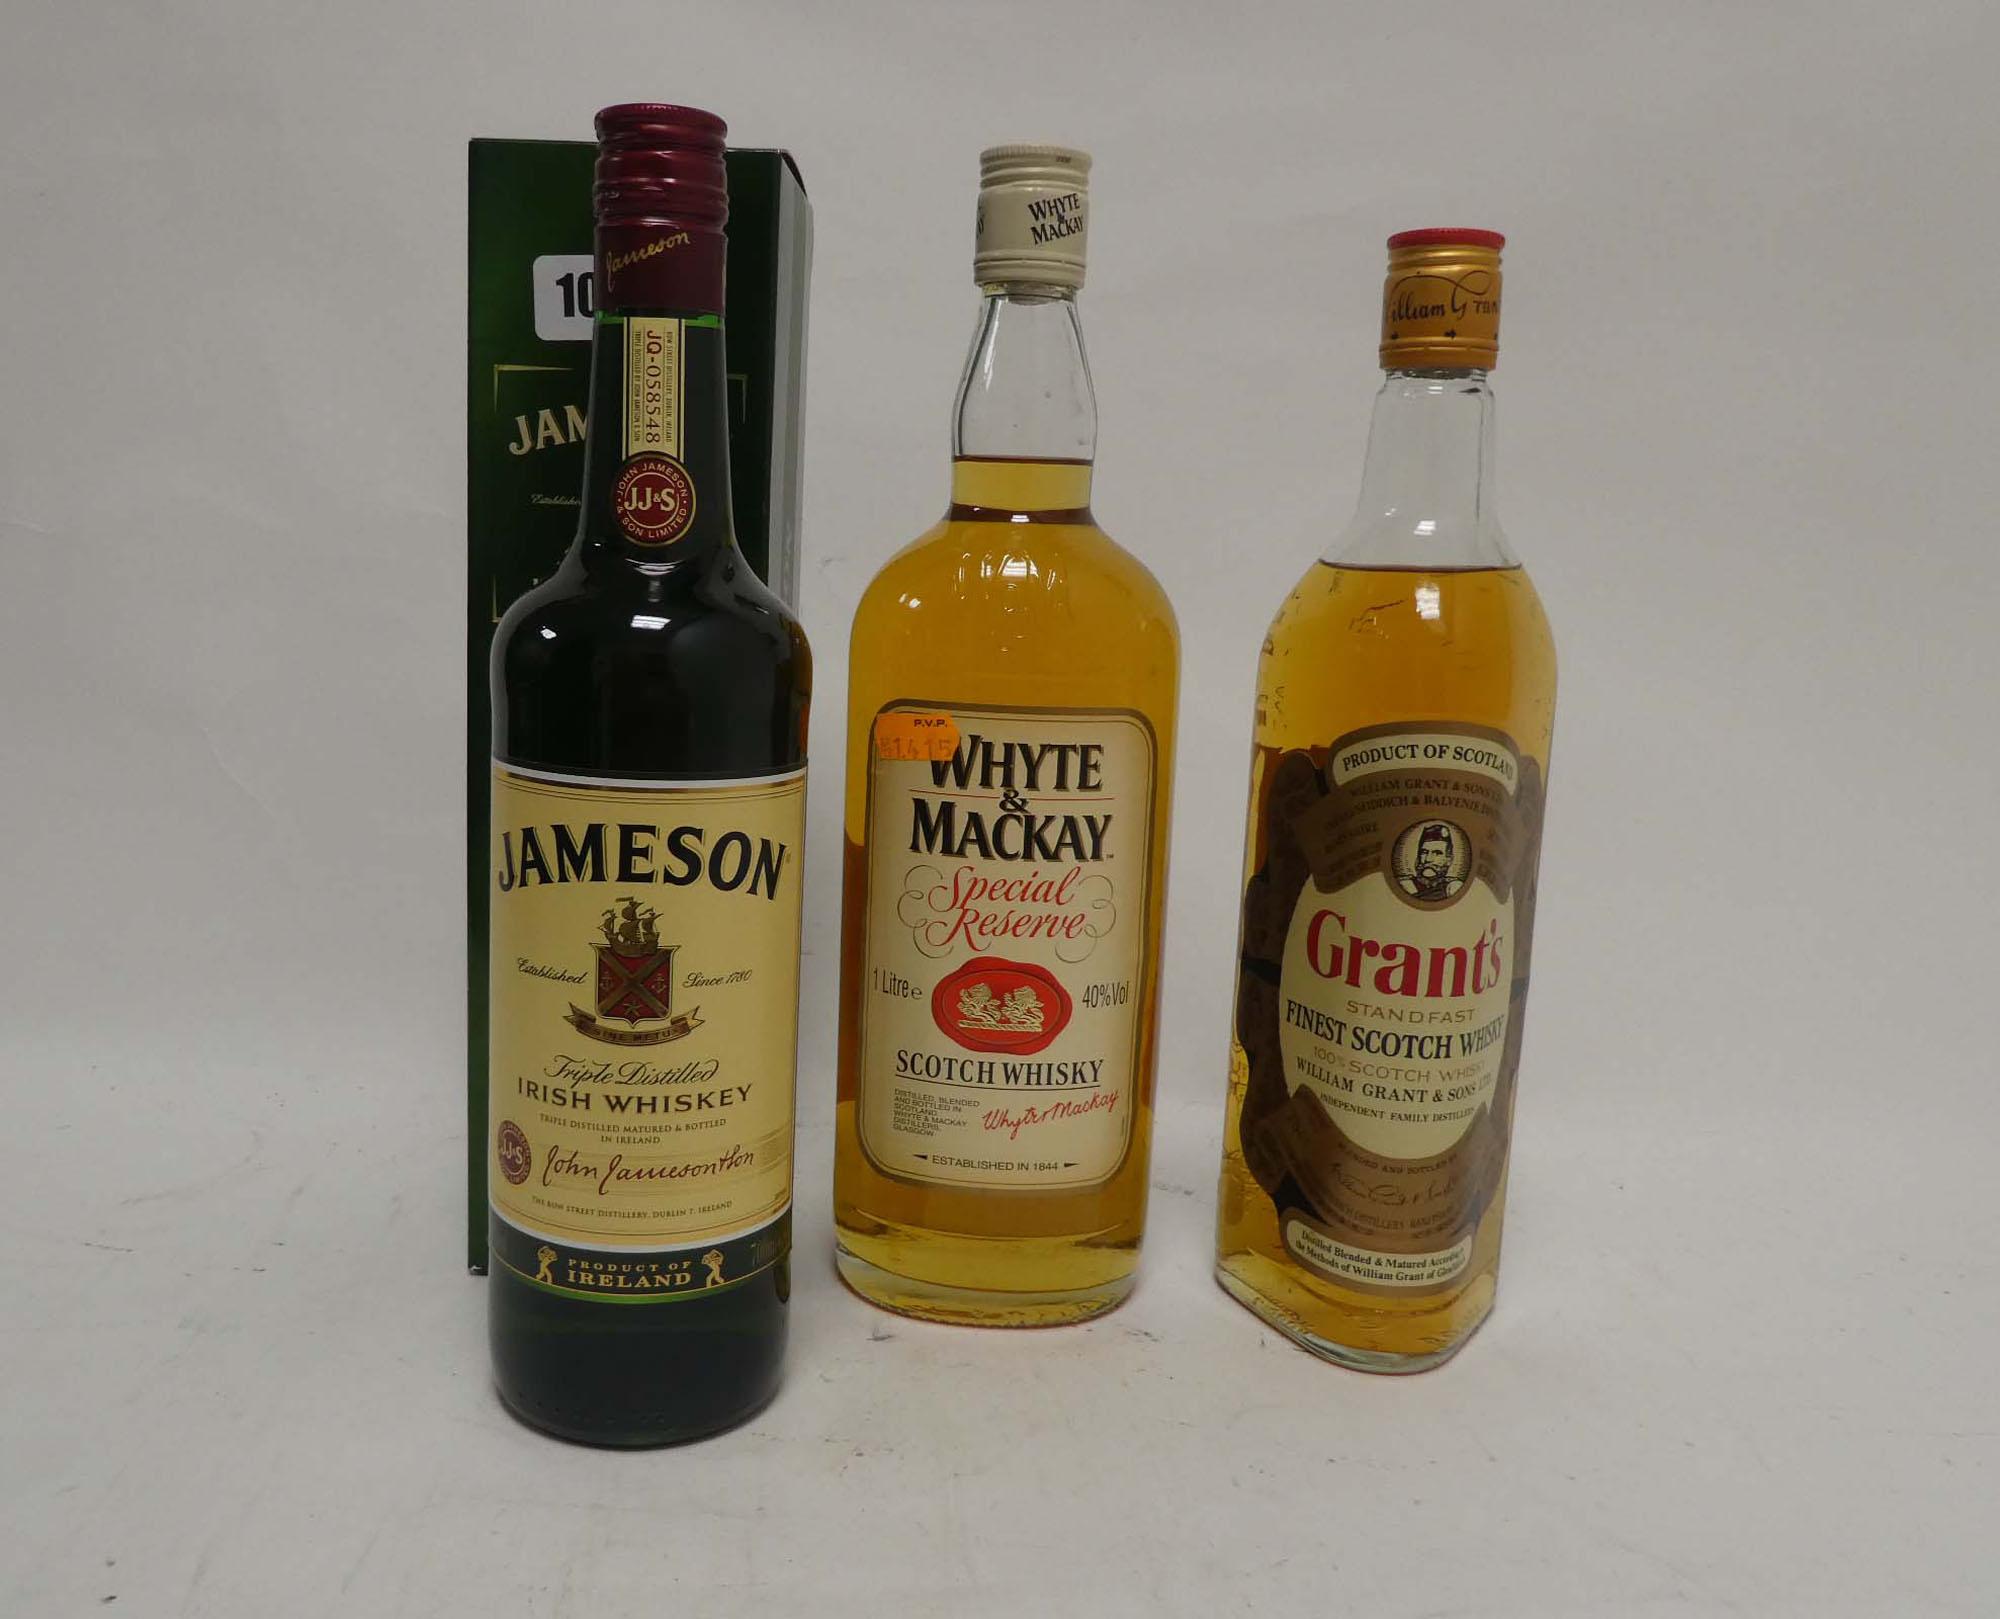 3 bottles, 1x Jameson Irish Whiskey with box 70cl 40%,